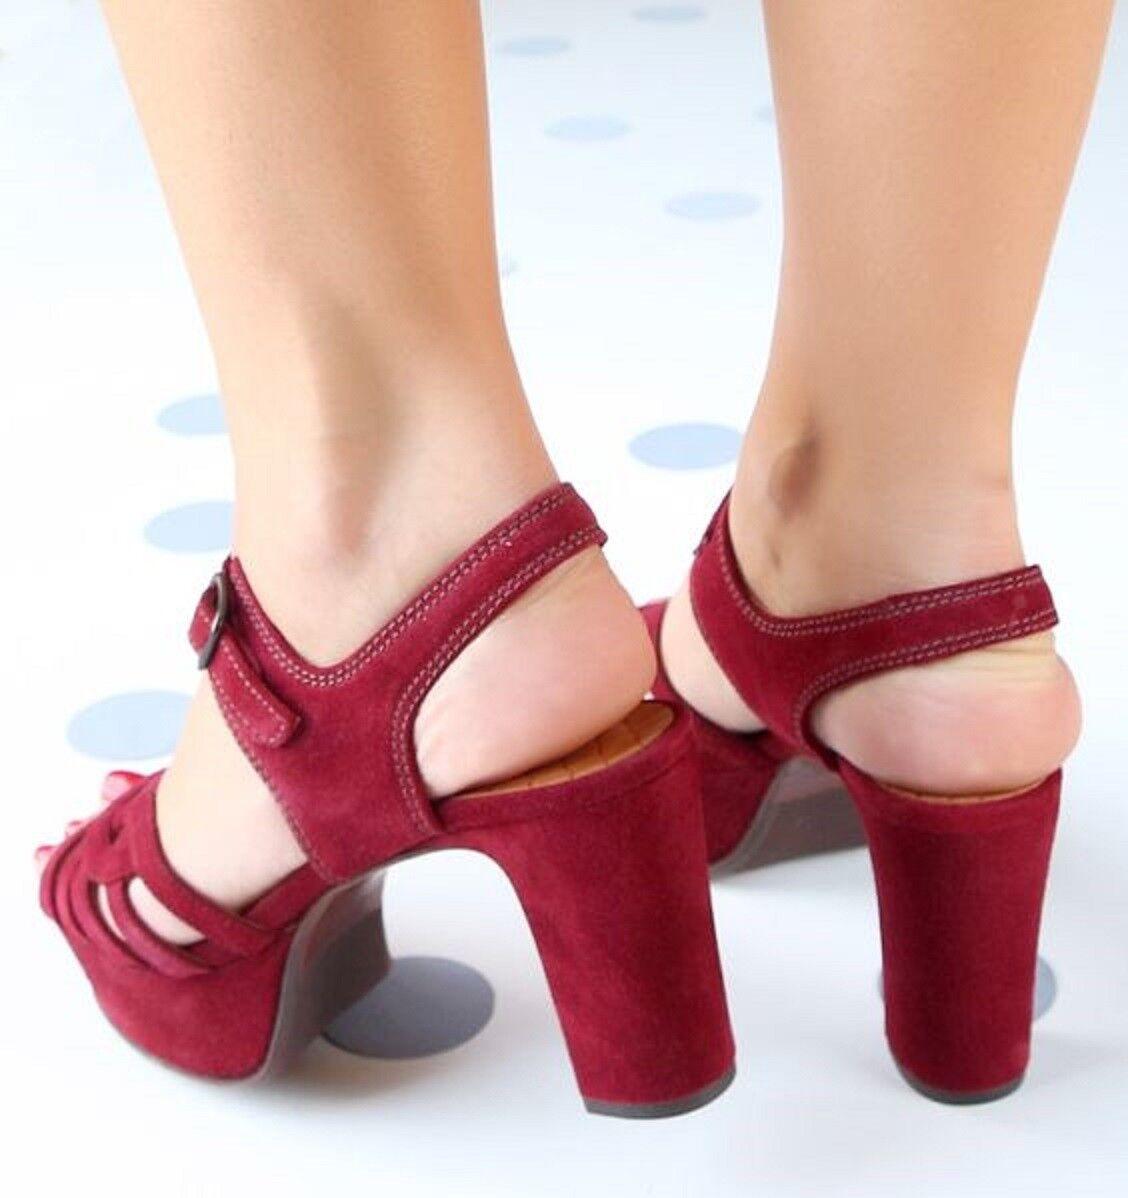 CHIE MIHARA Schuhe MARMA MARMA Schuhe PLATFORM HEELS BURGUNDY GRANATE SANDAL NEW NIB 40 480 3ad706